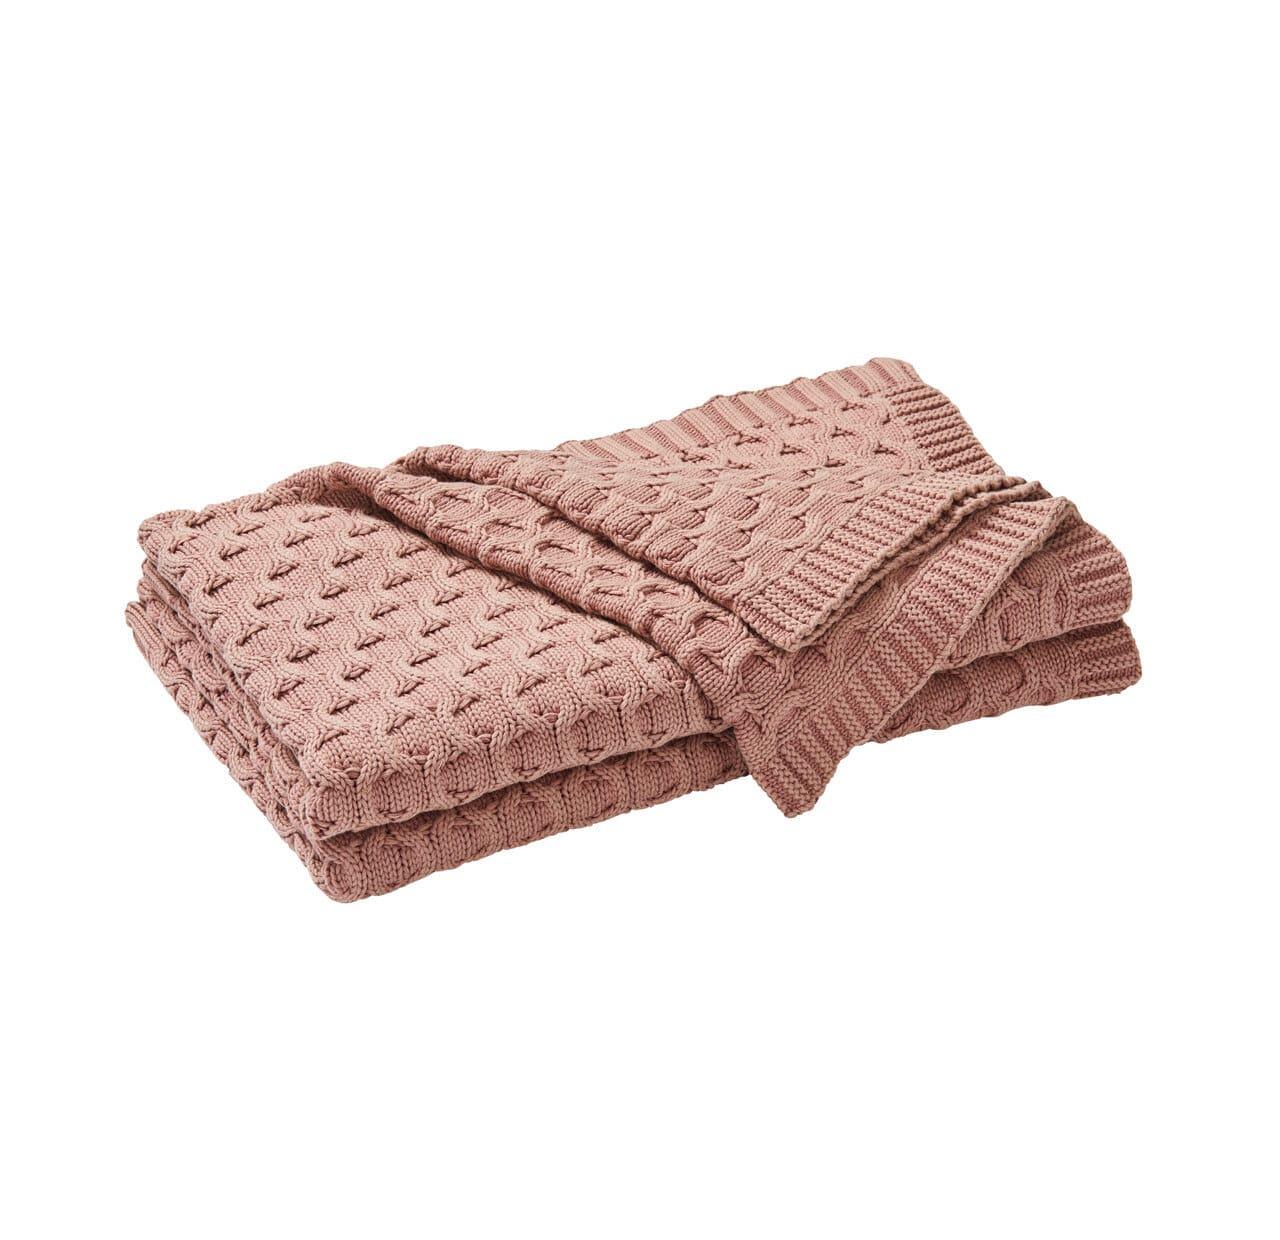 Delaney Throw Rug - Cameo Pink